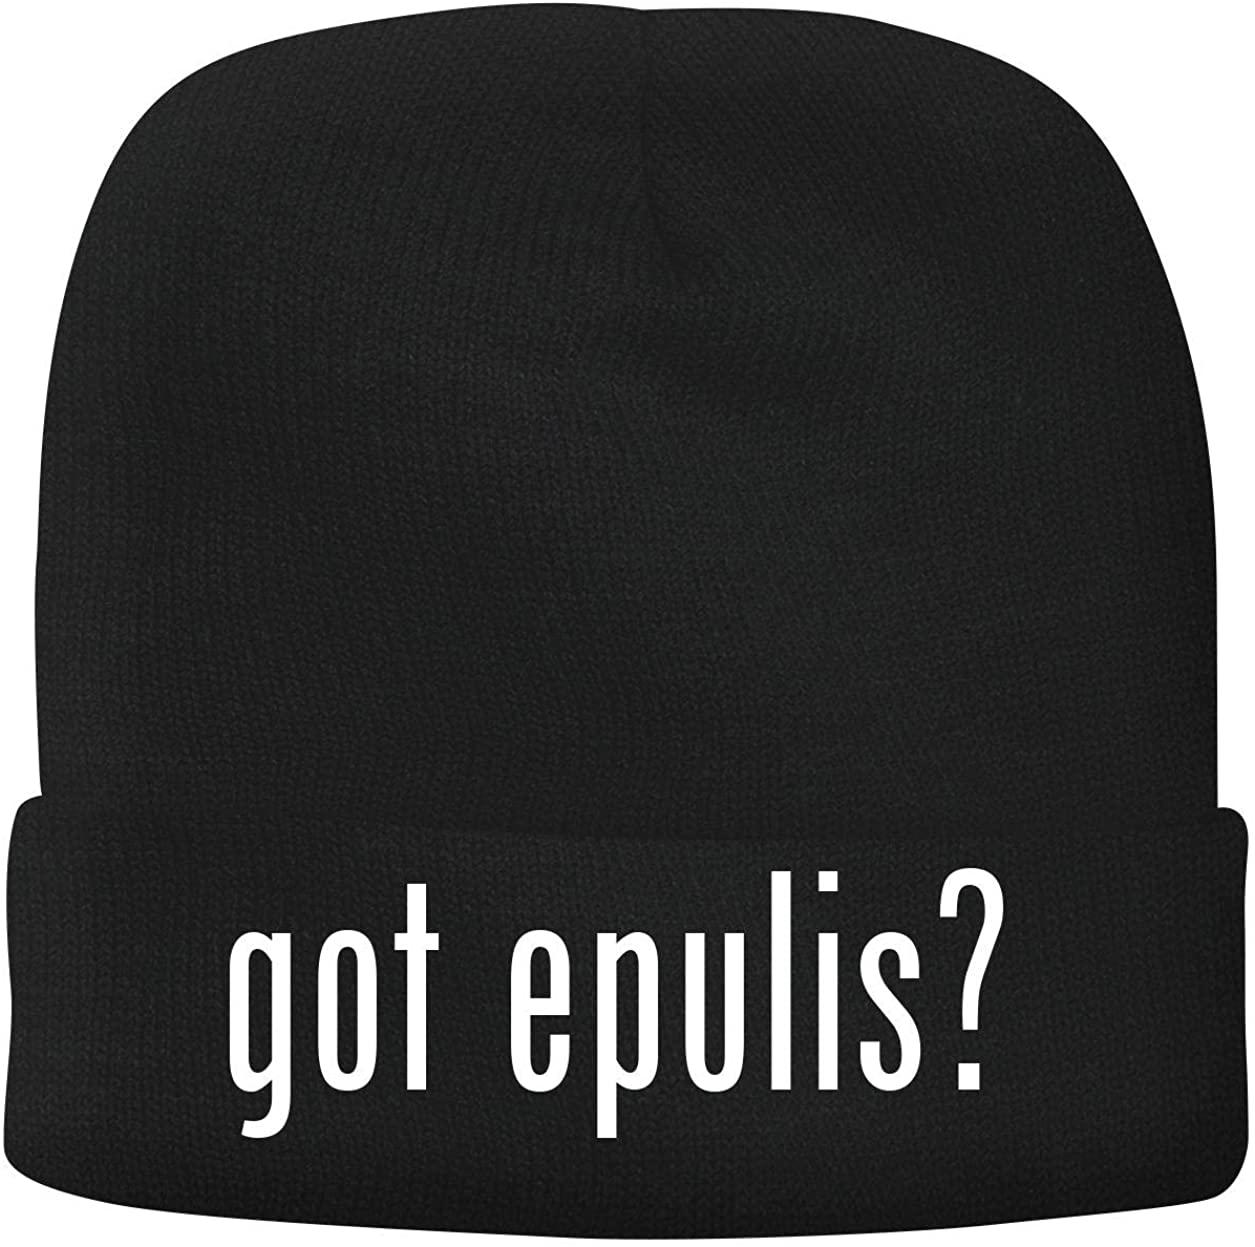 BH Cool Designs got Epulis? - Men's Soft & Comfortable Beanie Hat Cap